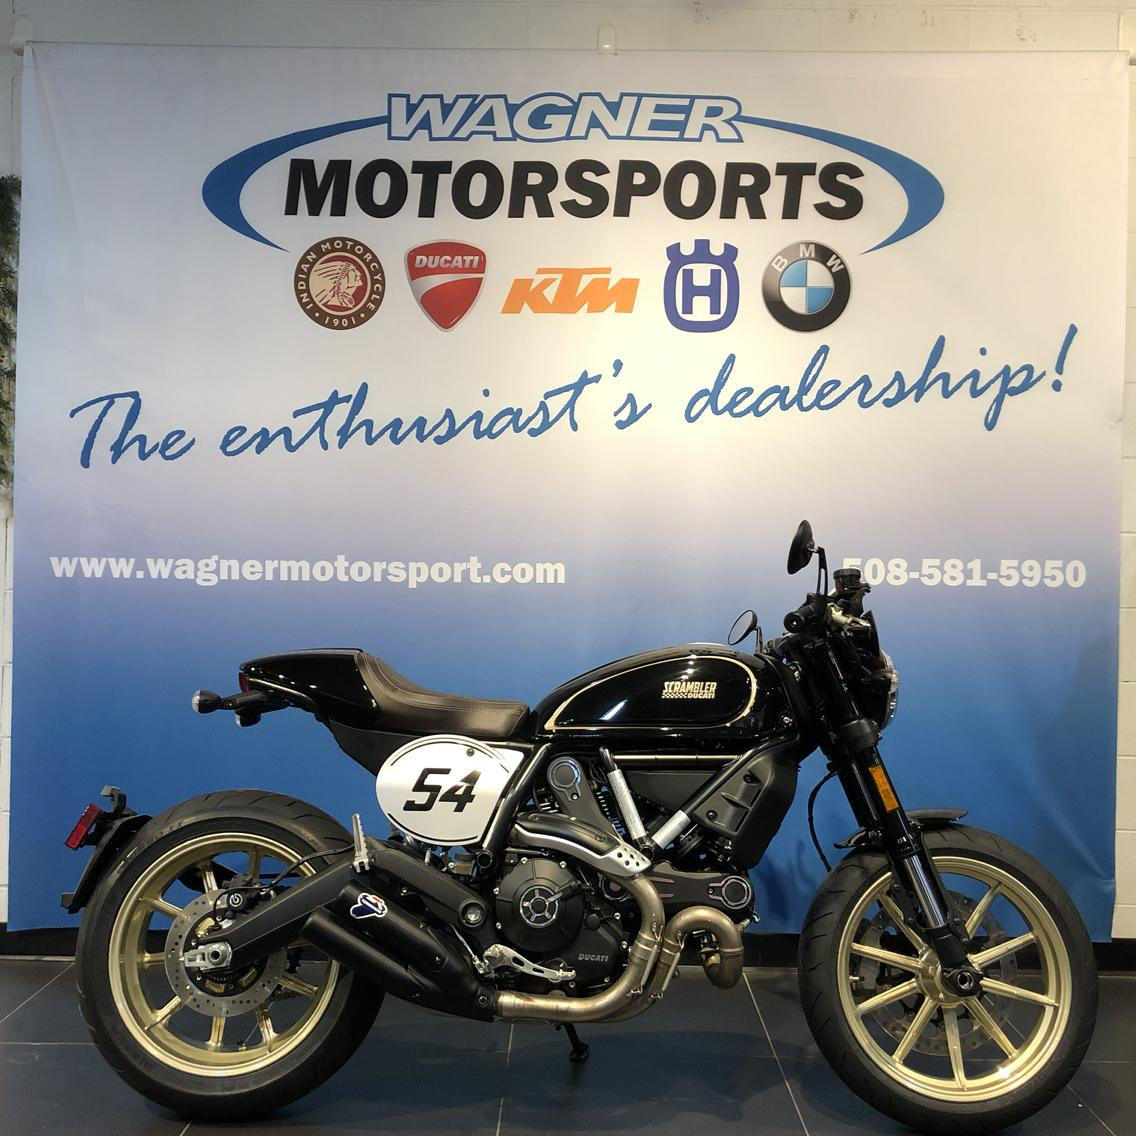 2018 Ducati Scrambler Café Racer For Sale In Worcester Ma Wagner